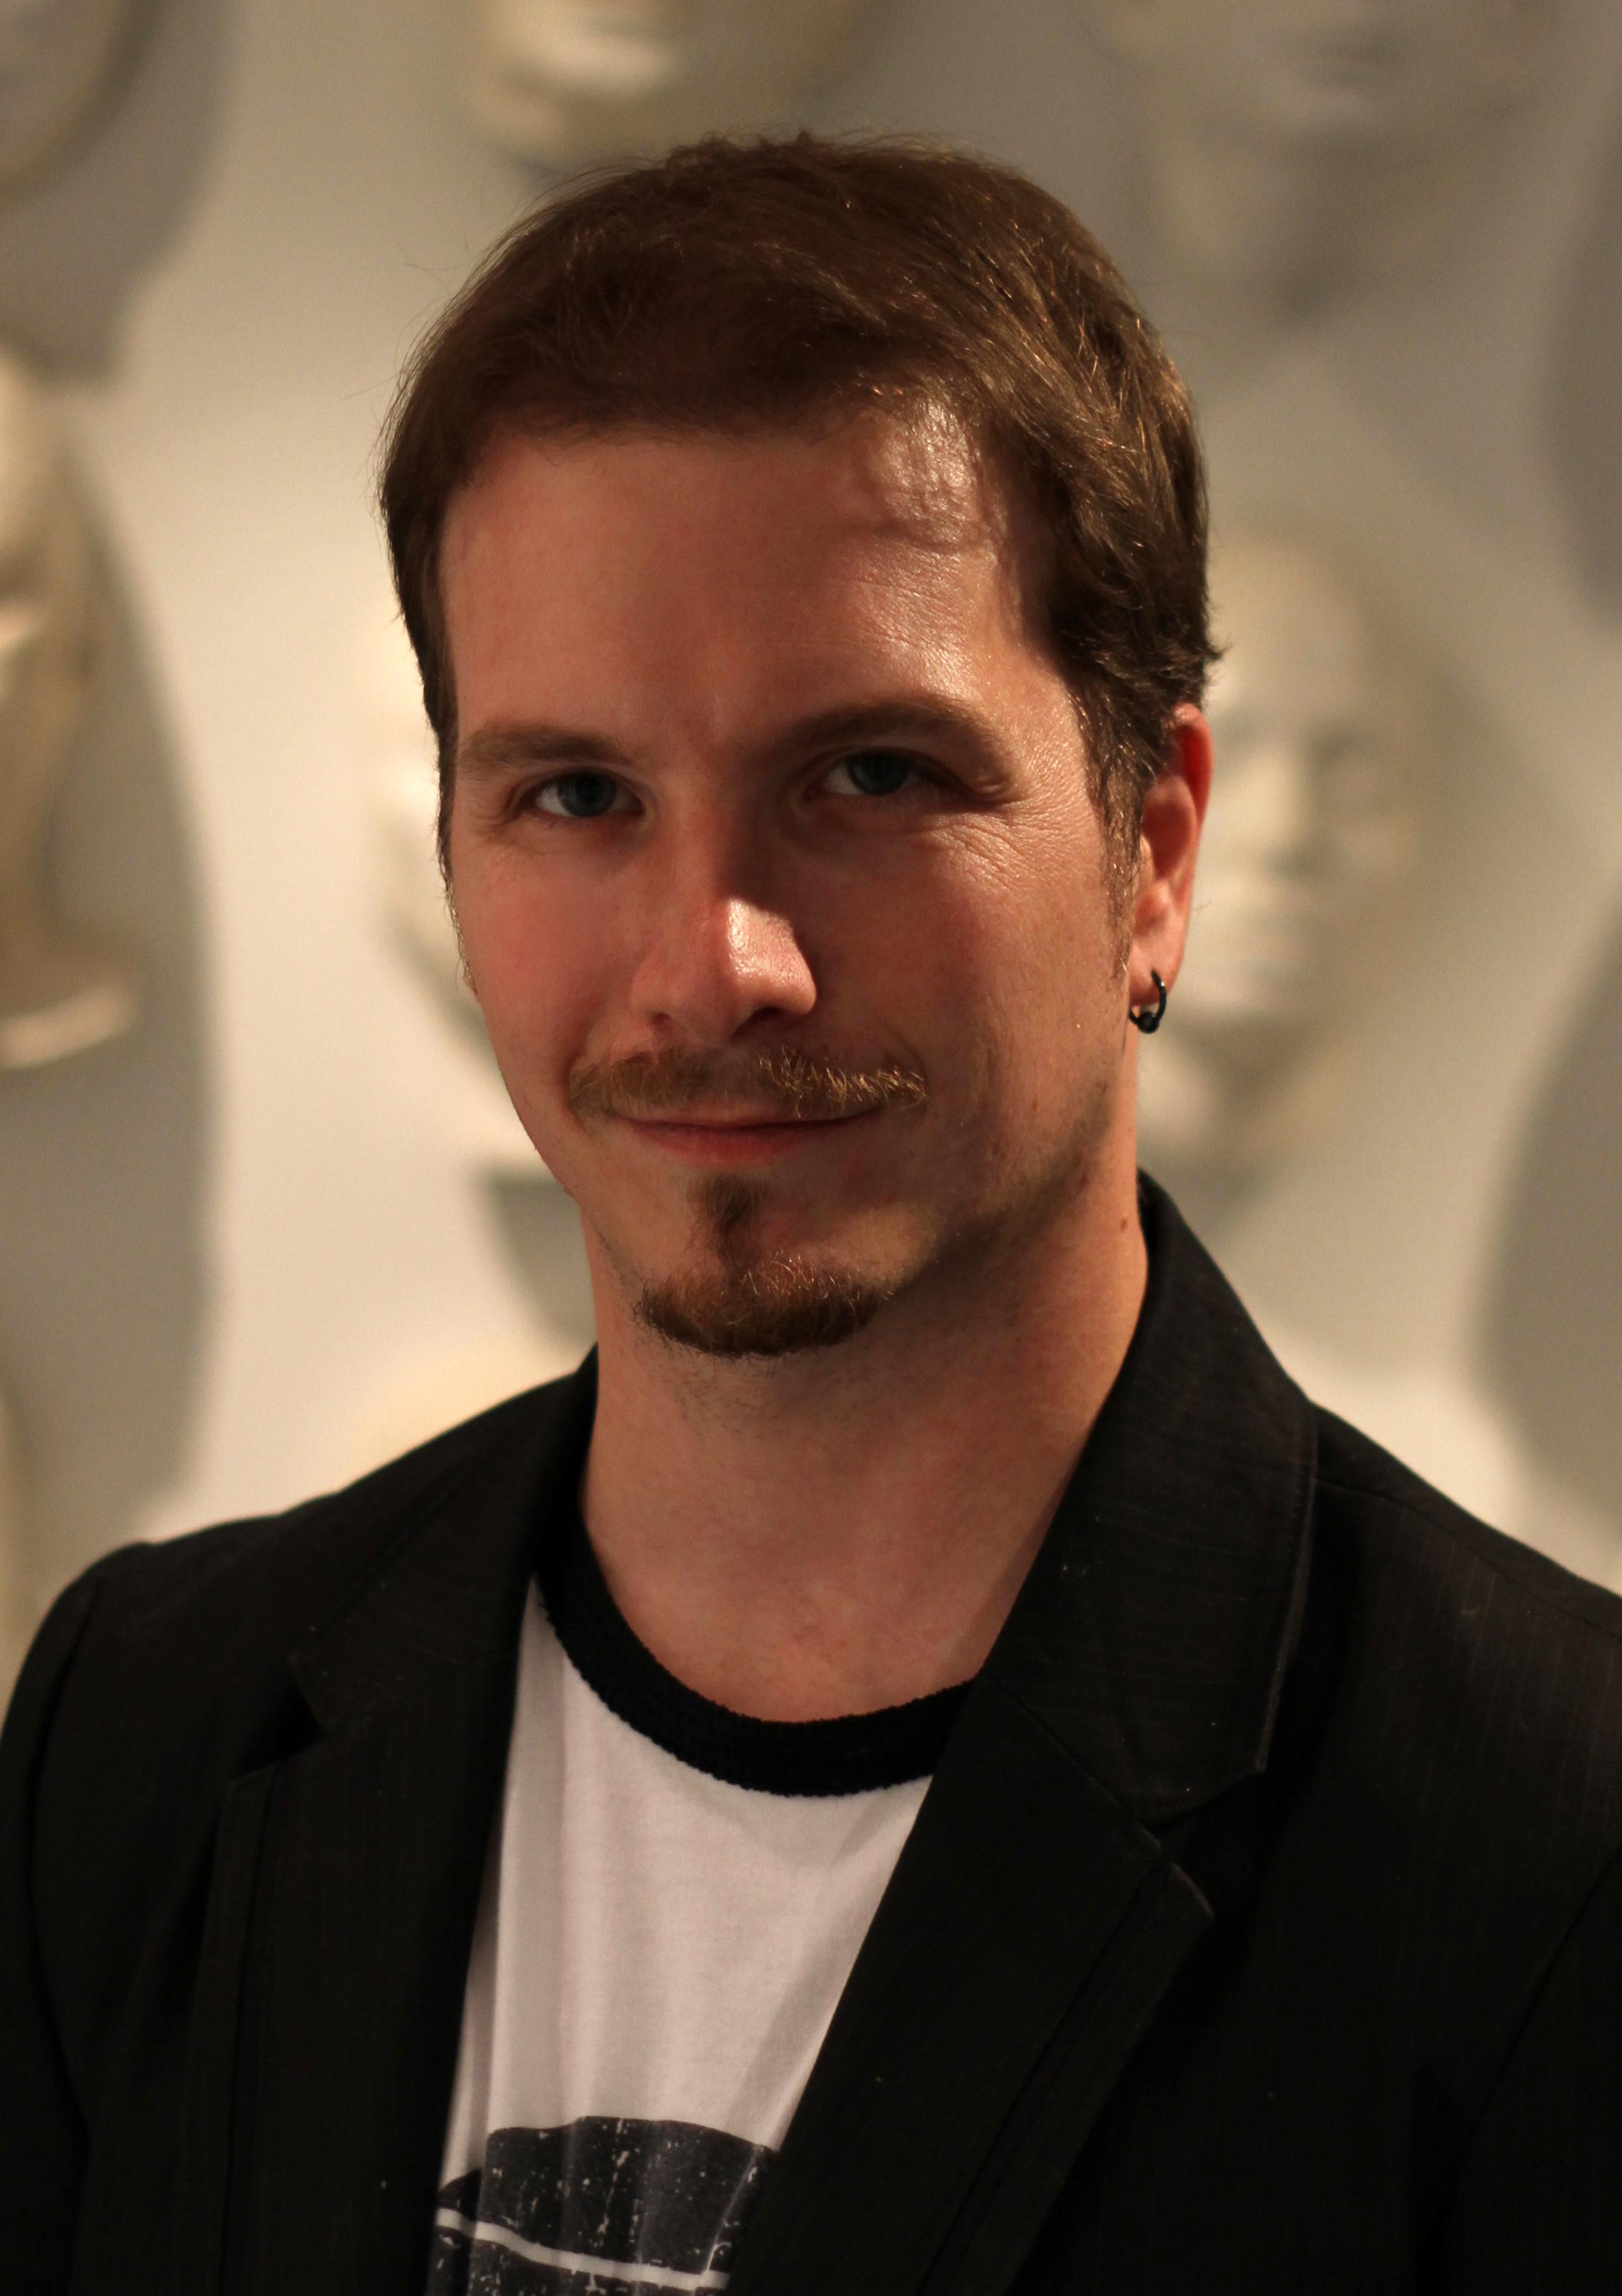 Adrien Morot